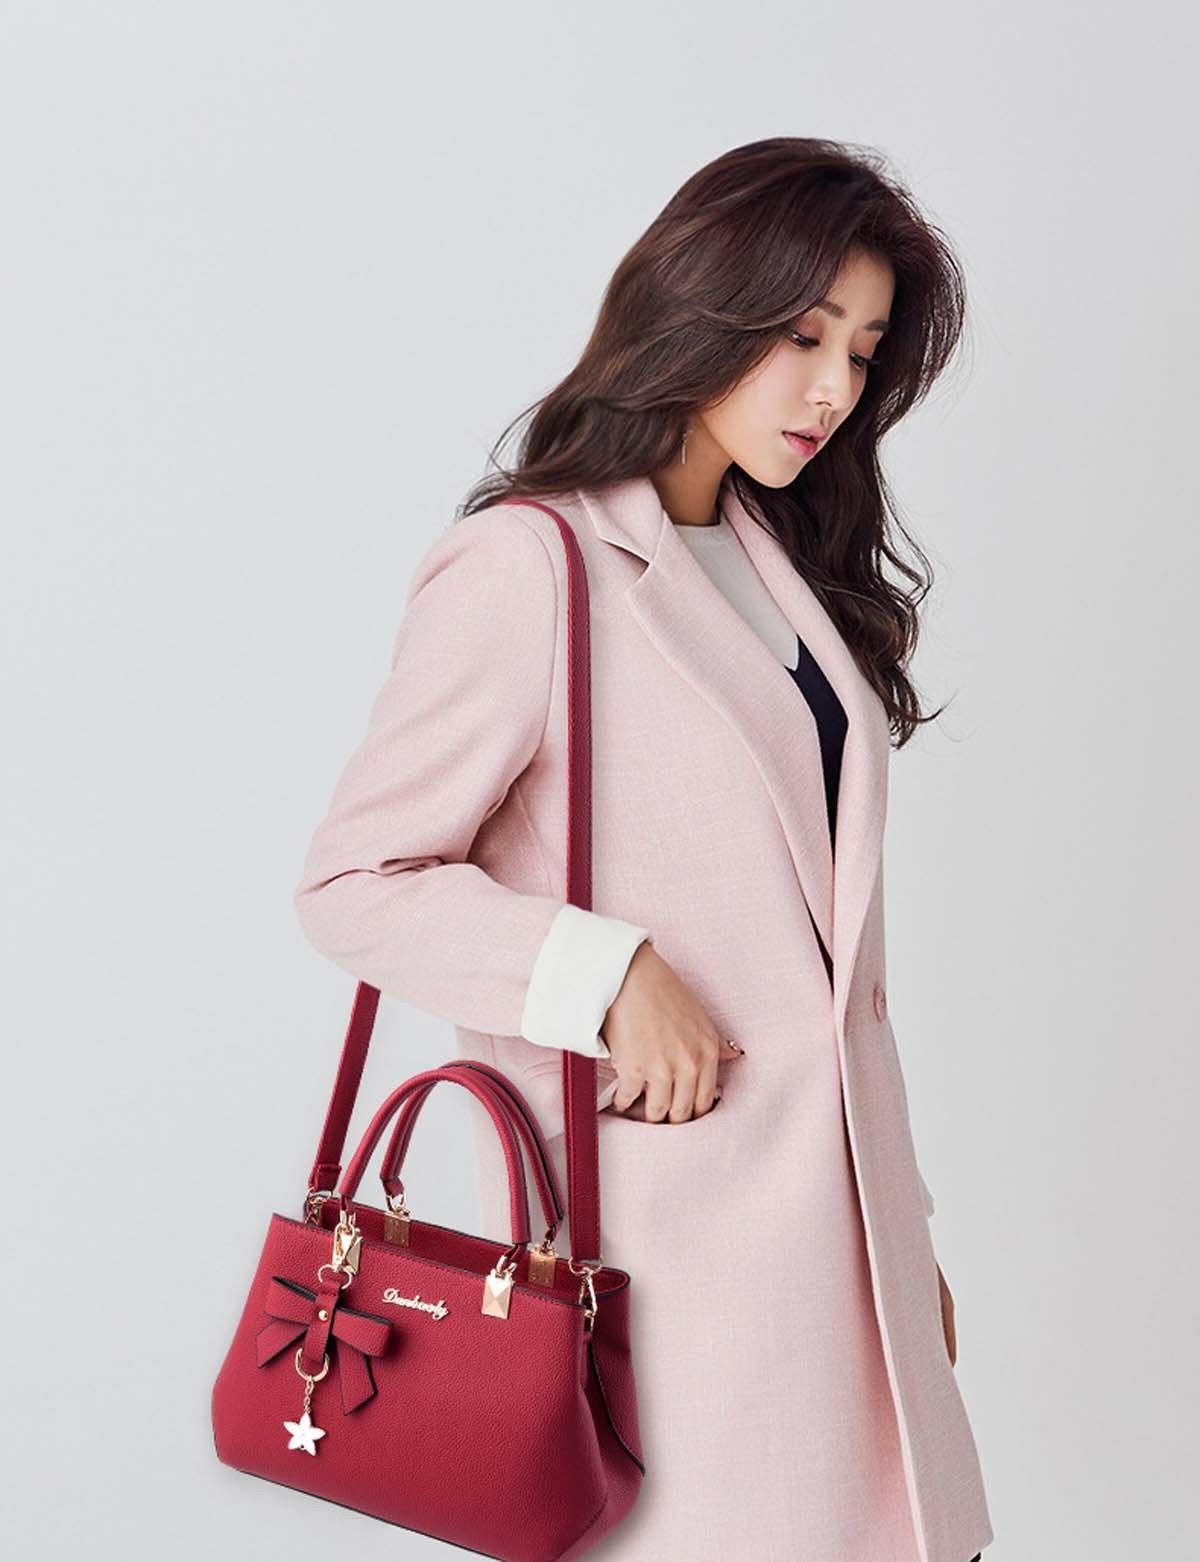 Women Leather Handbags Messenger Satchel Tote Crossbody Bags